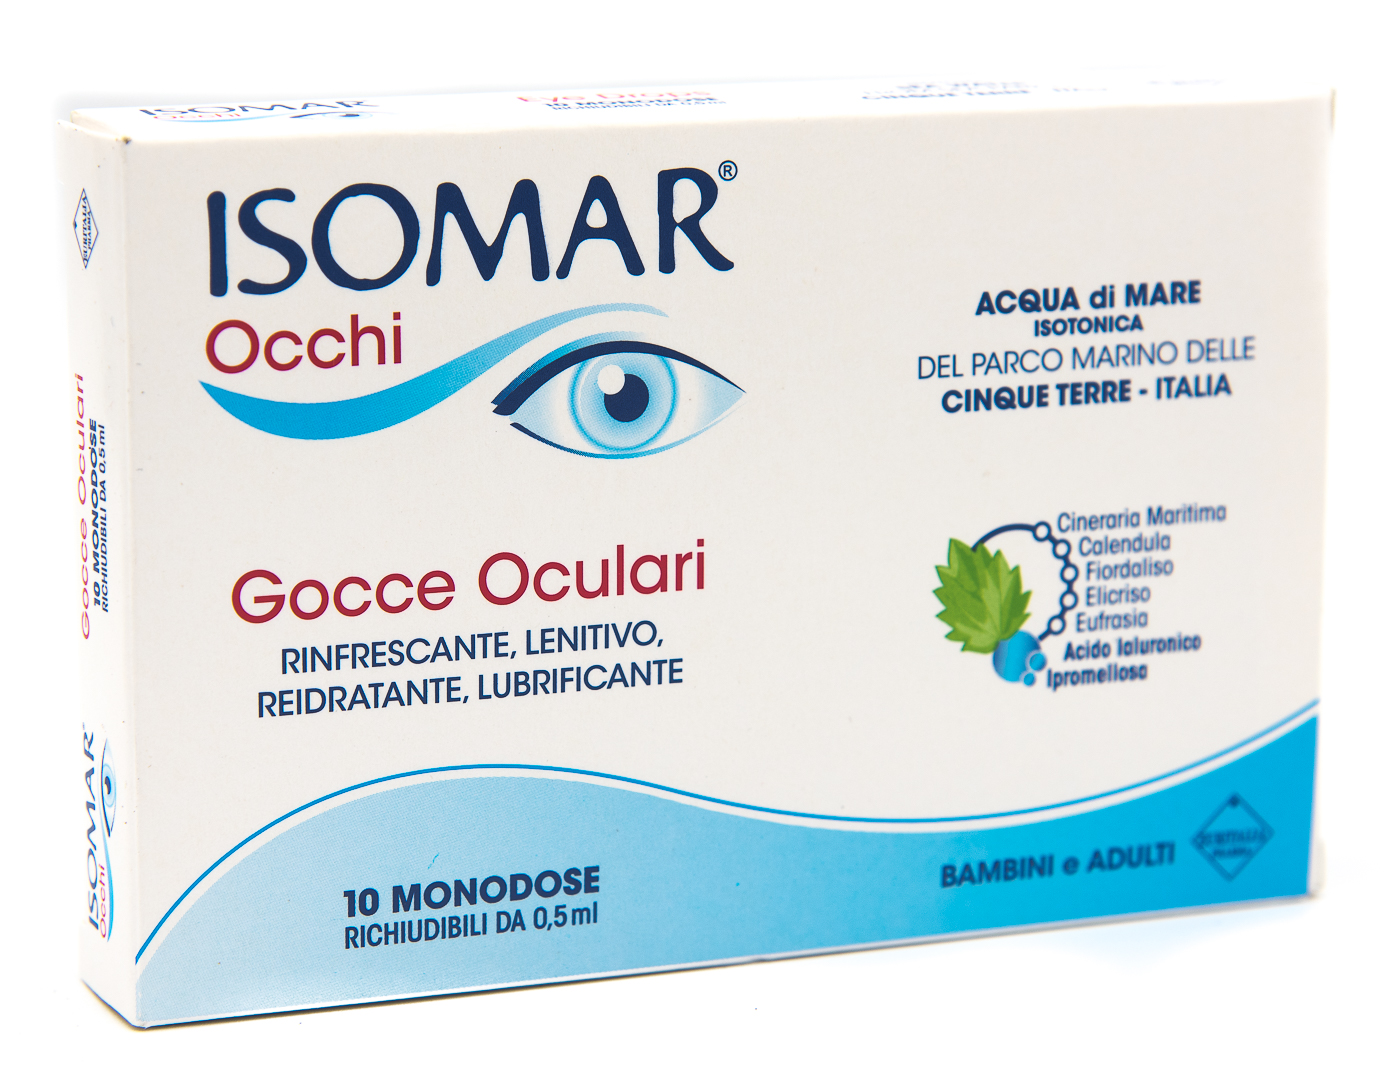 COSWELL SpA Isomar Occhi Gocce Oculari Monodose 10flx0.5ml